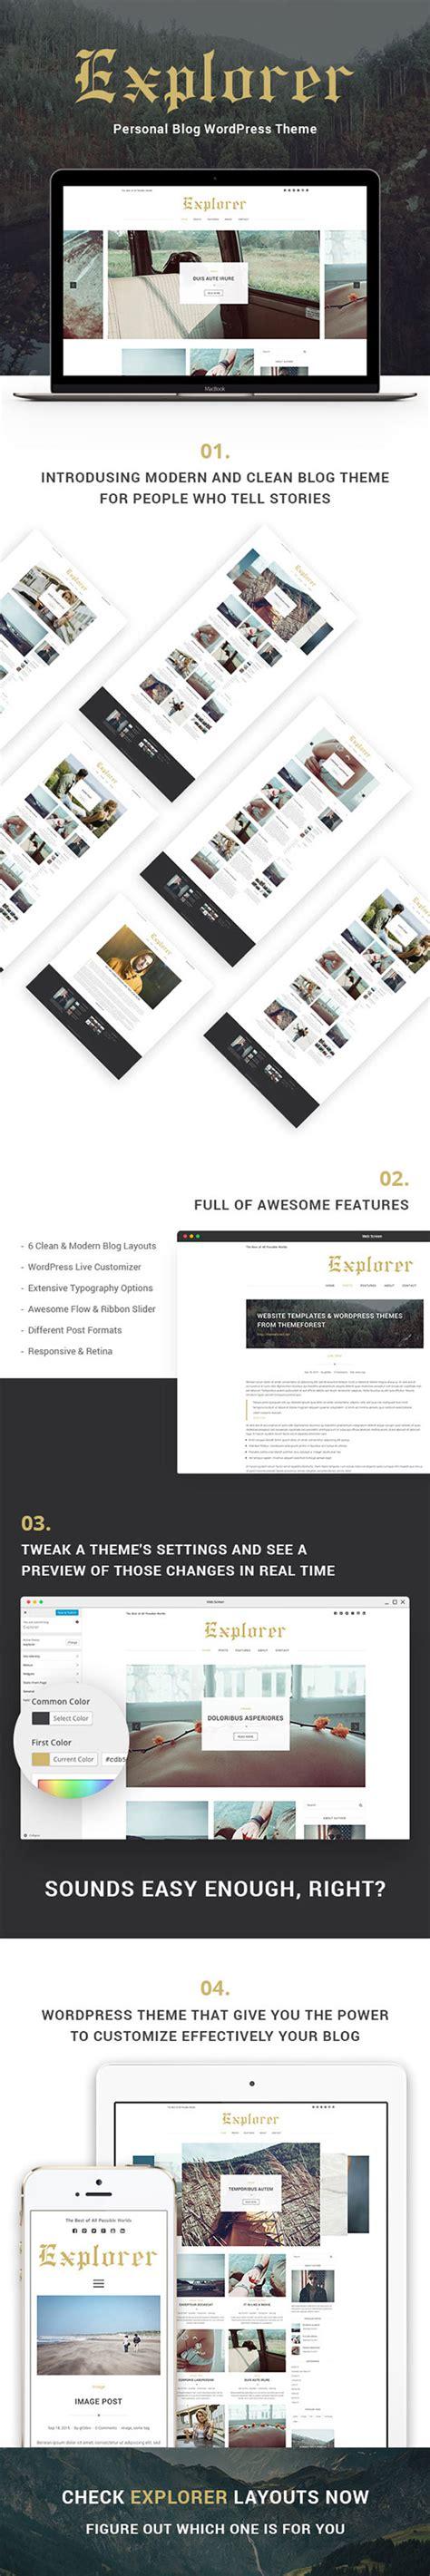 wordpress layout internet explorer explorer personal blog wordpress theme